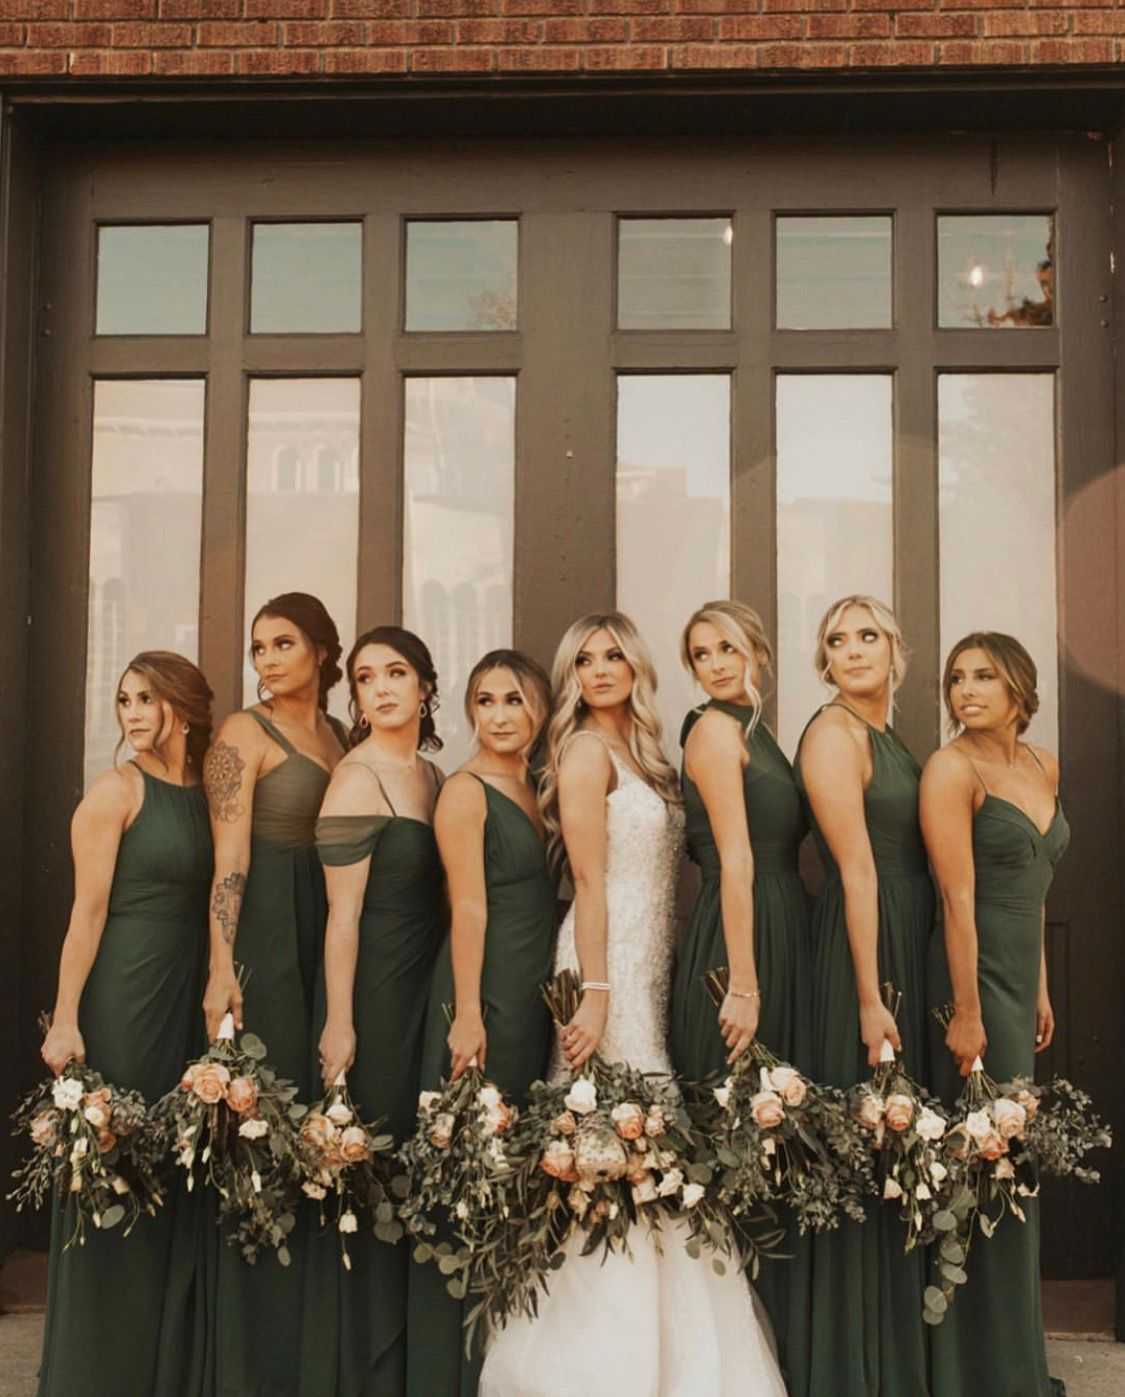 Forest Green Bridesmaids Dresses Forest Green Bridesmaid Dresses Fall Bridesmaid Dresses Green Bridesmaid Dresses [ 1397 x 1125 Pixel ]